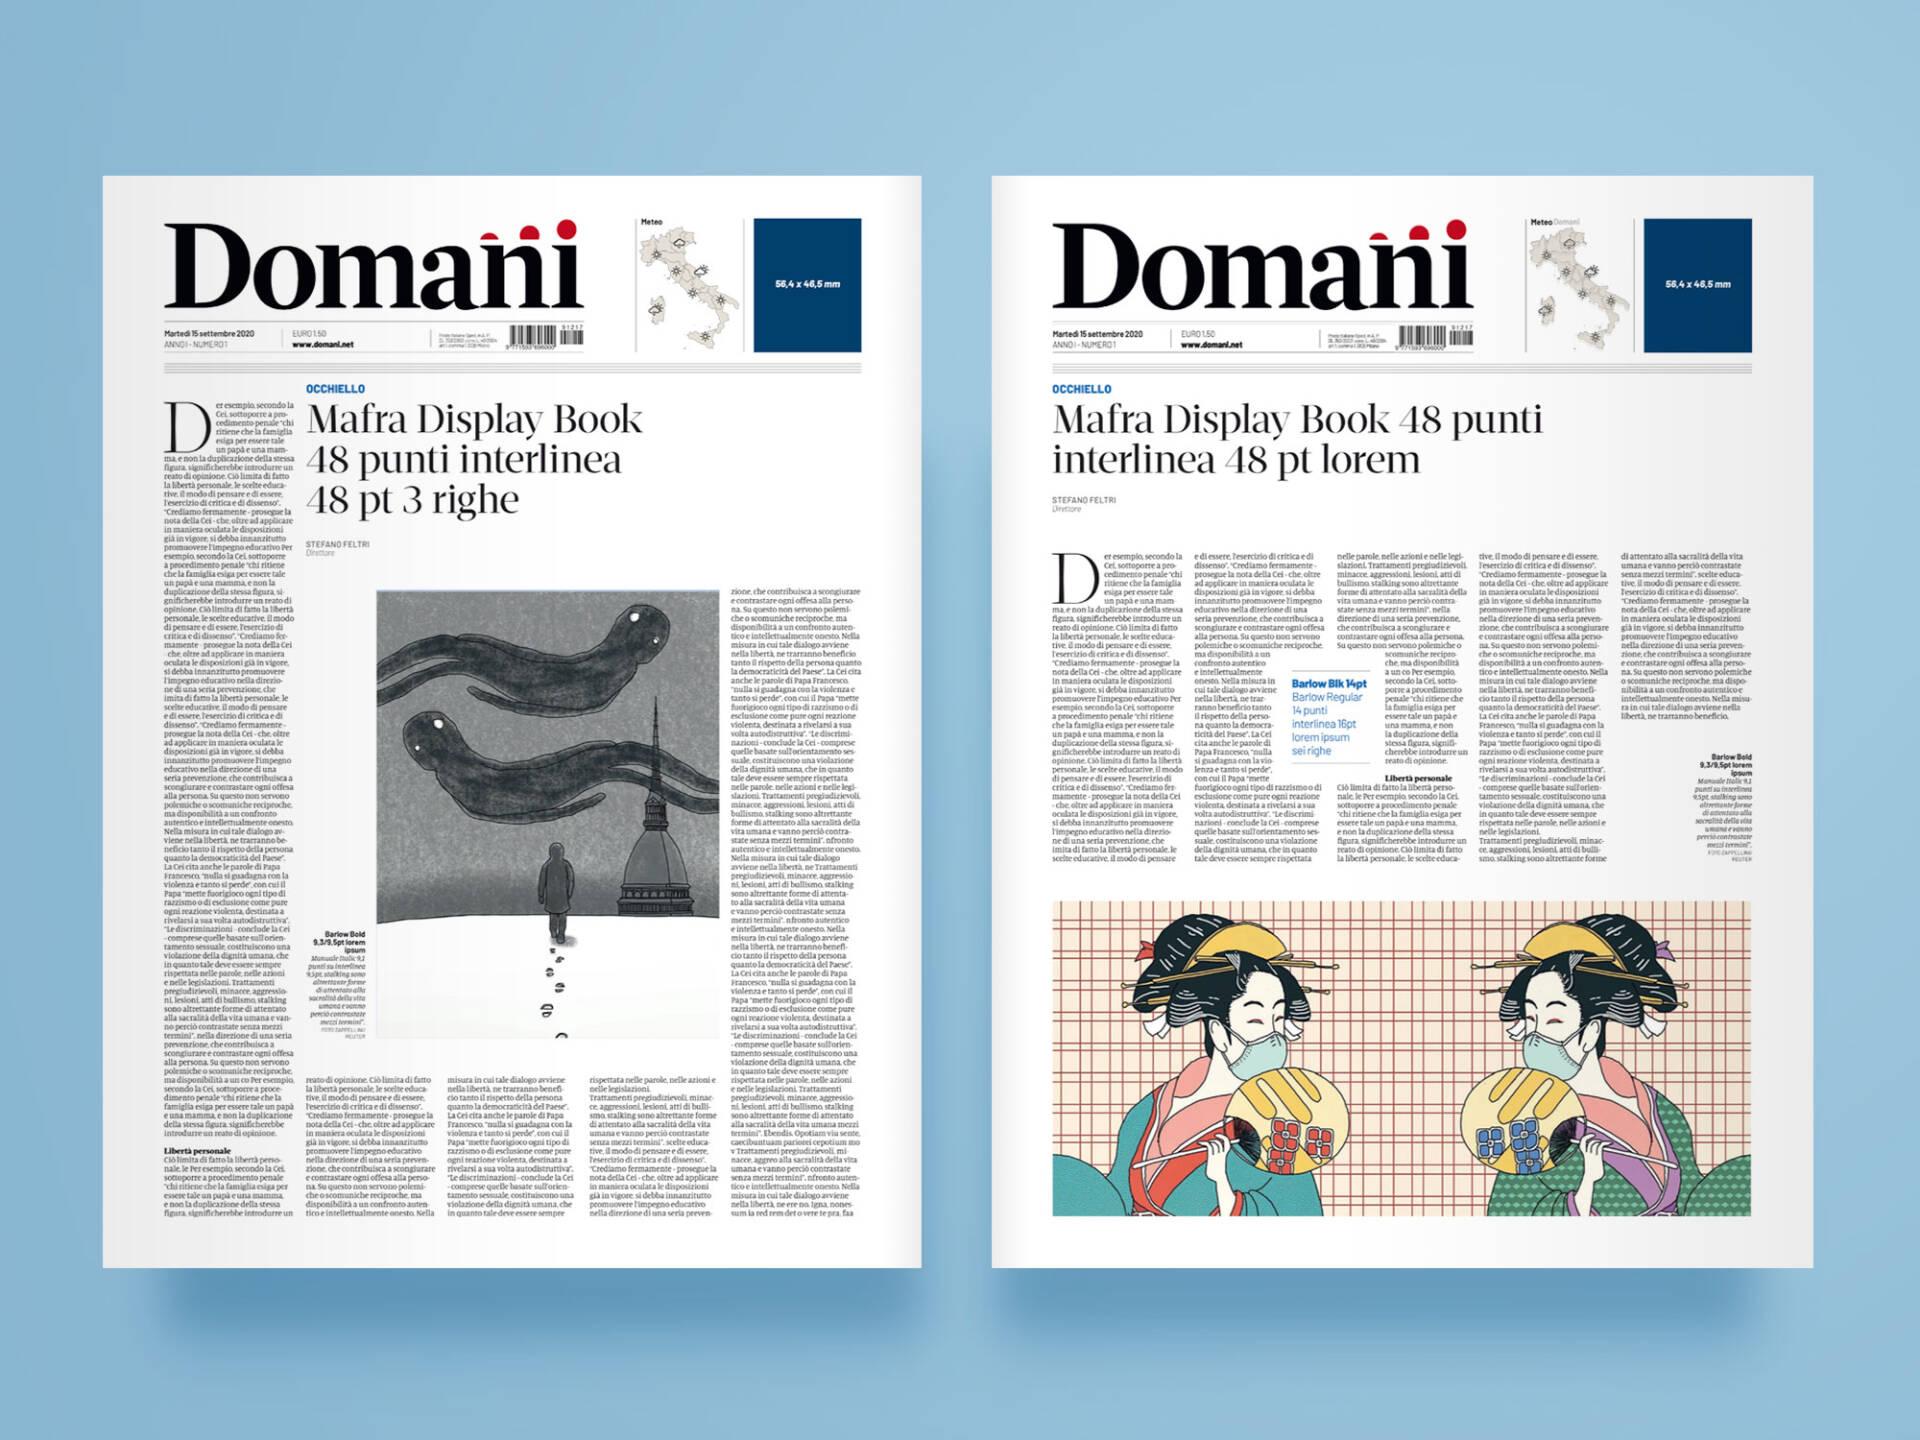 Domani_Print_Frontpage_Wenceslau_News_Design09